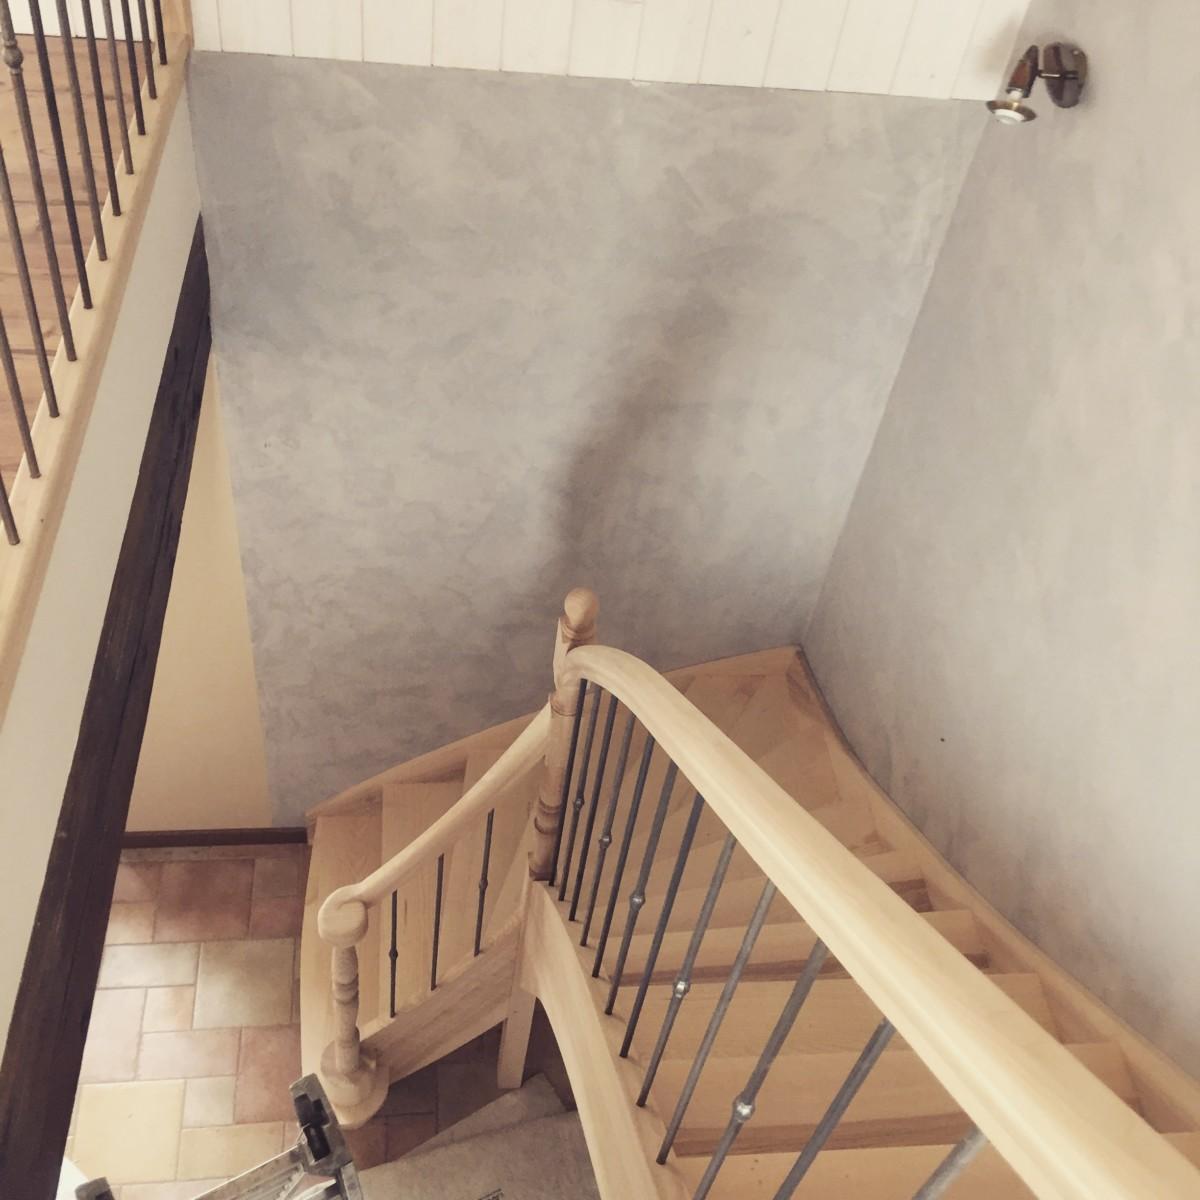 REGIS BERTHELOT Fabricant Escaliers Longue Jumelles IMG 4217